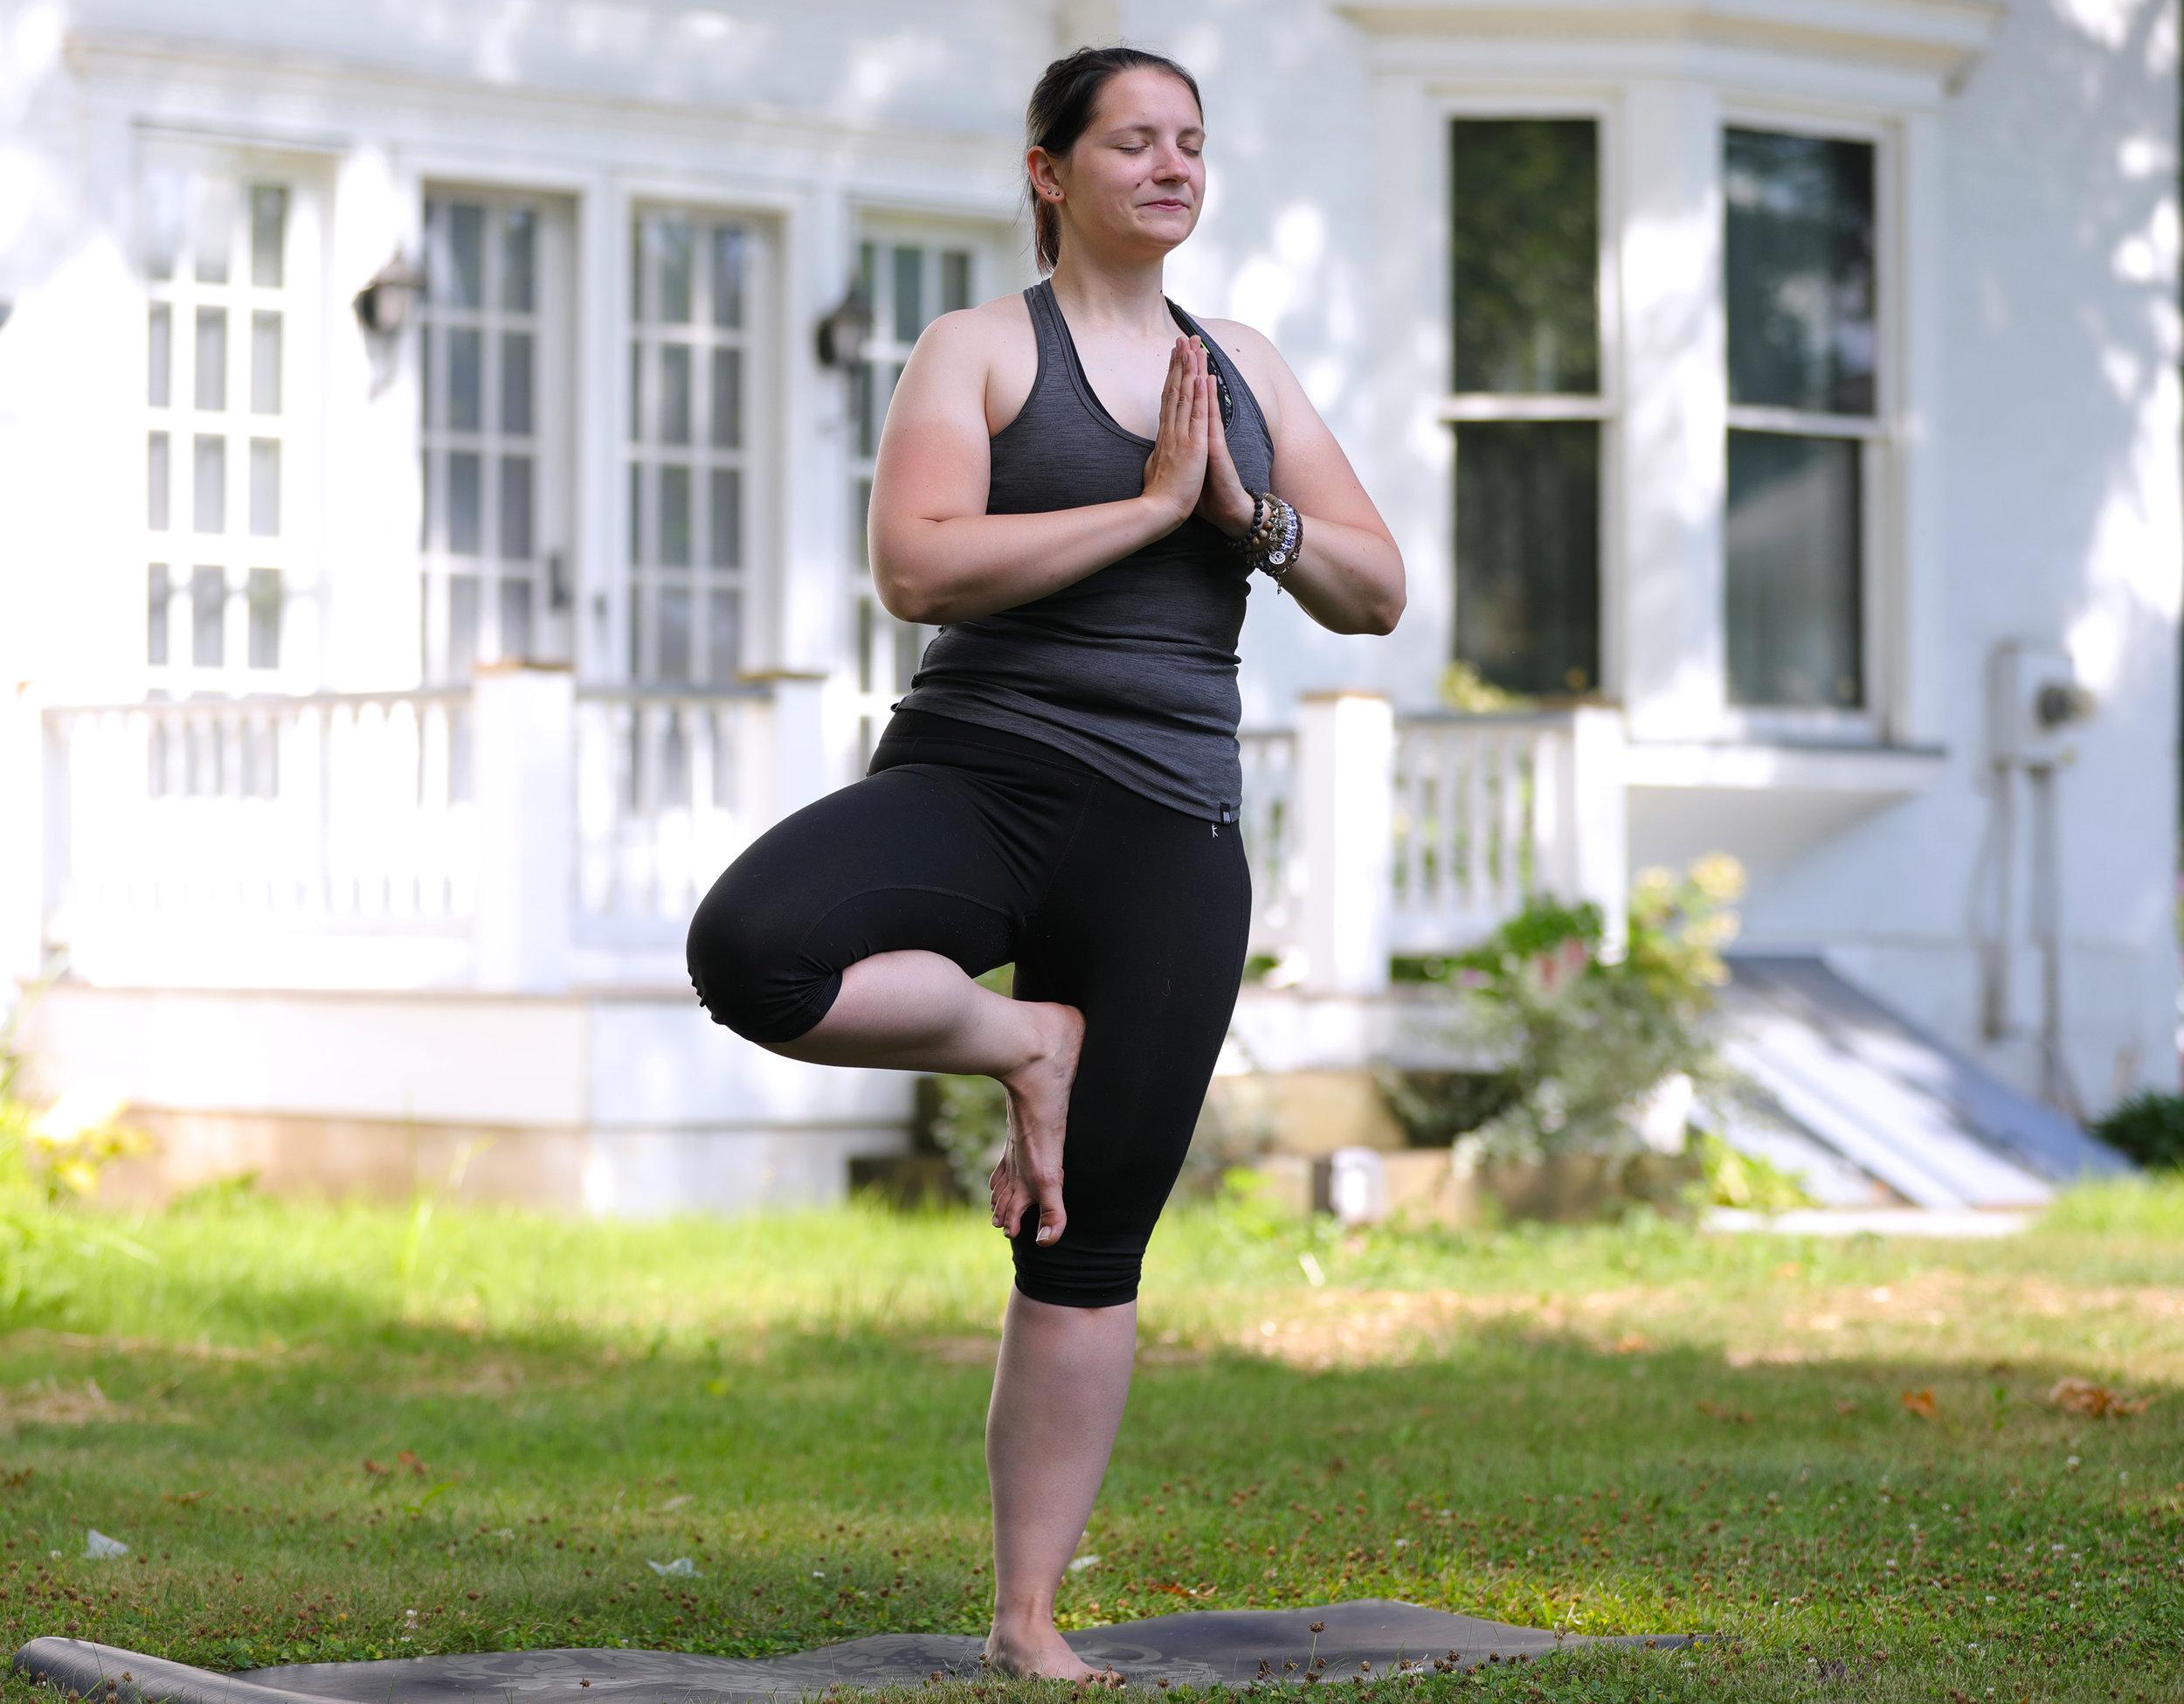 Aubrey yoga one legged pose.jpg